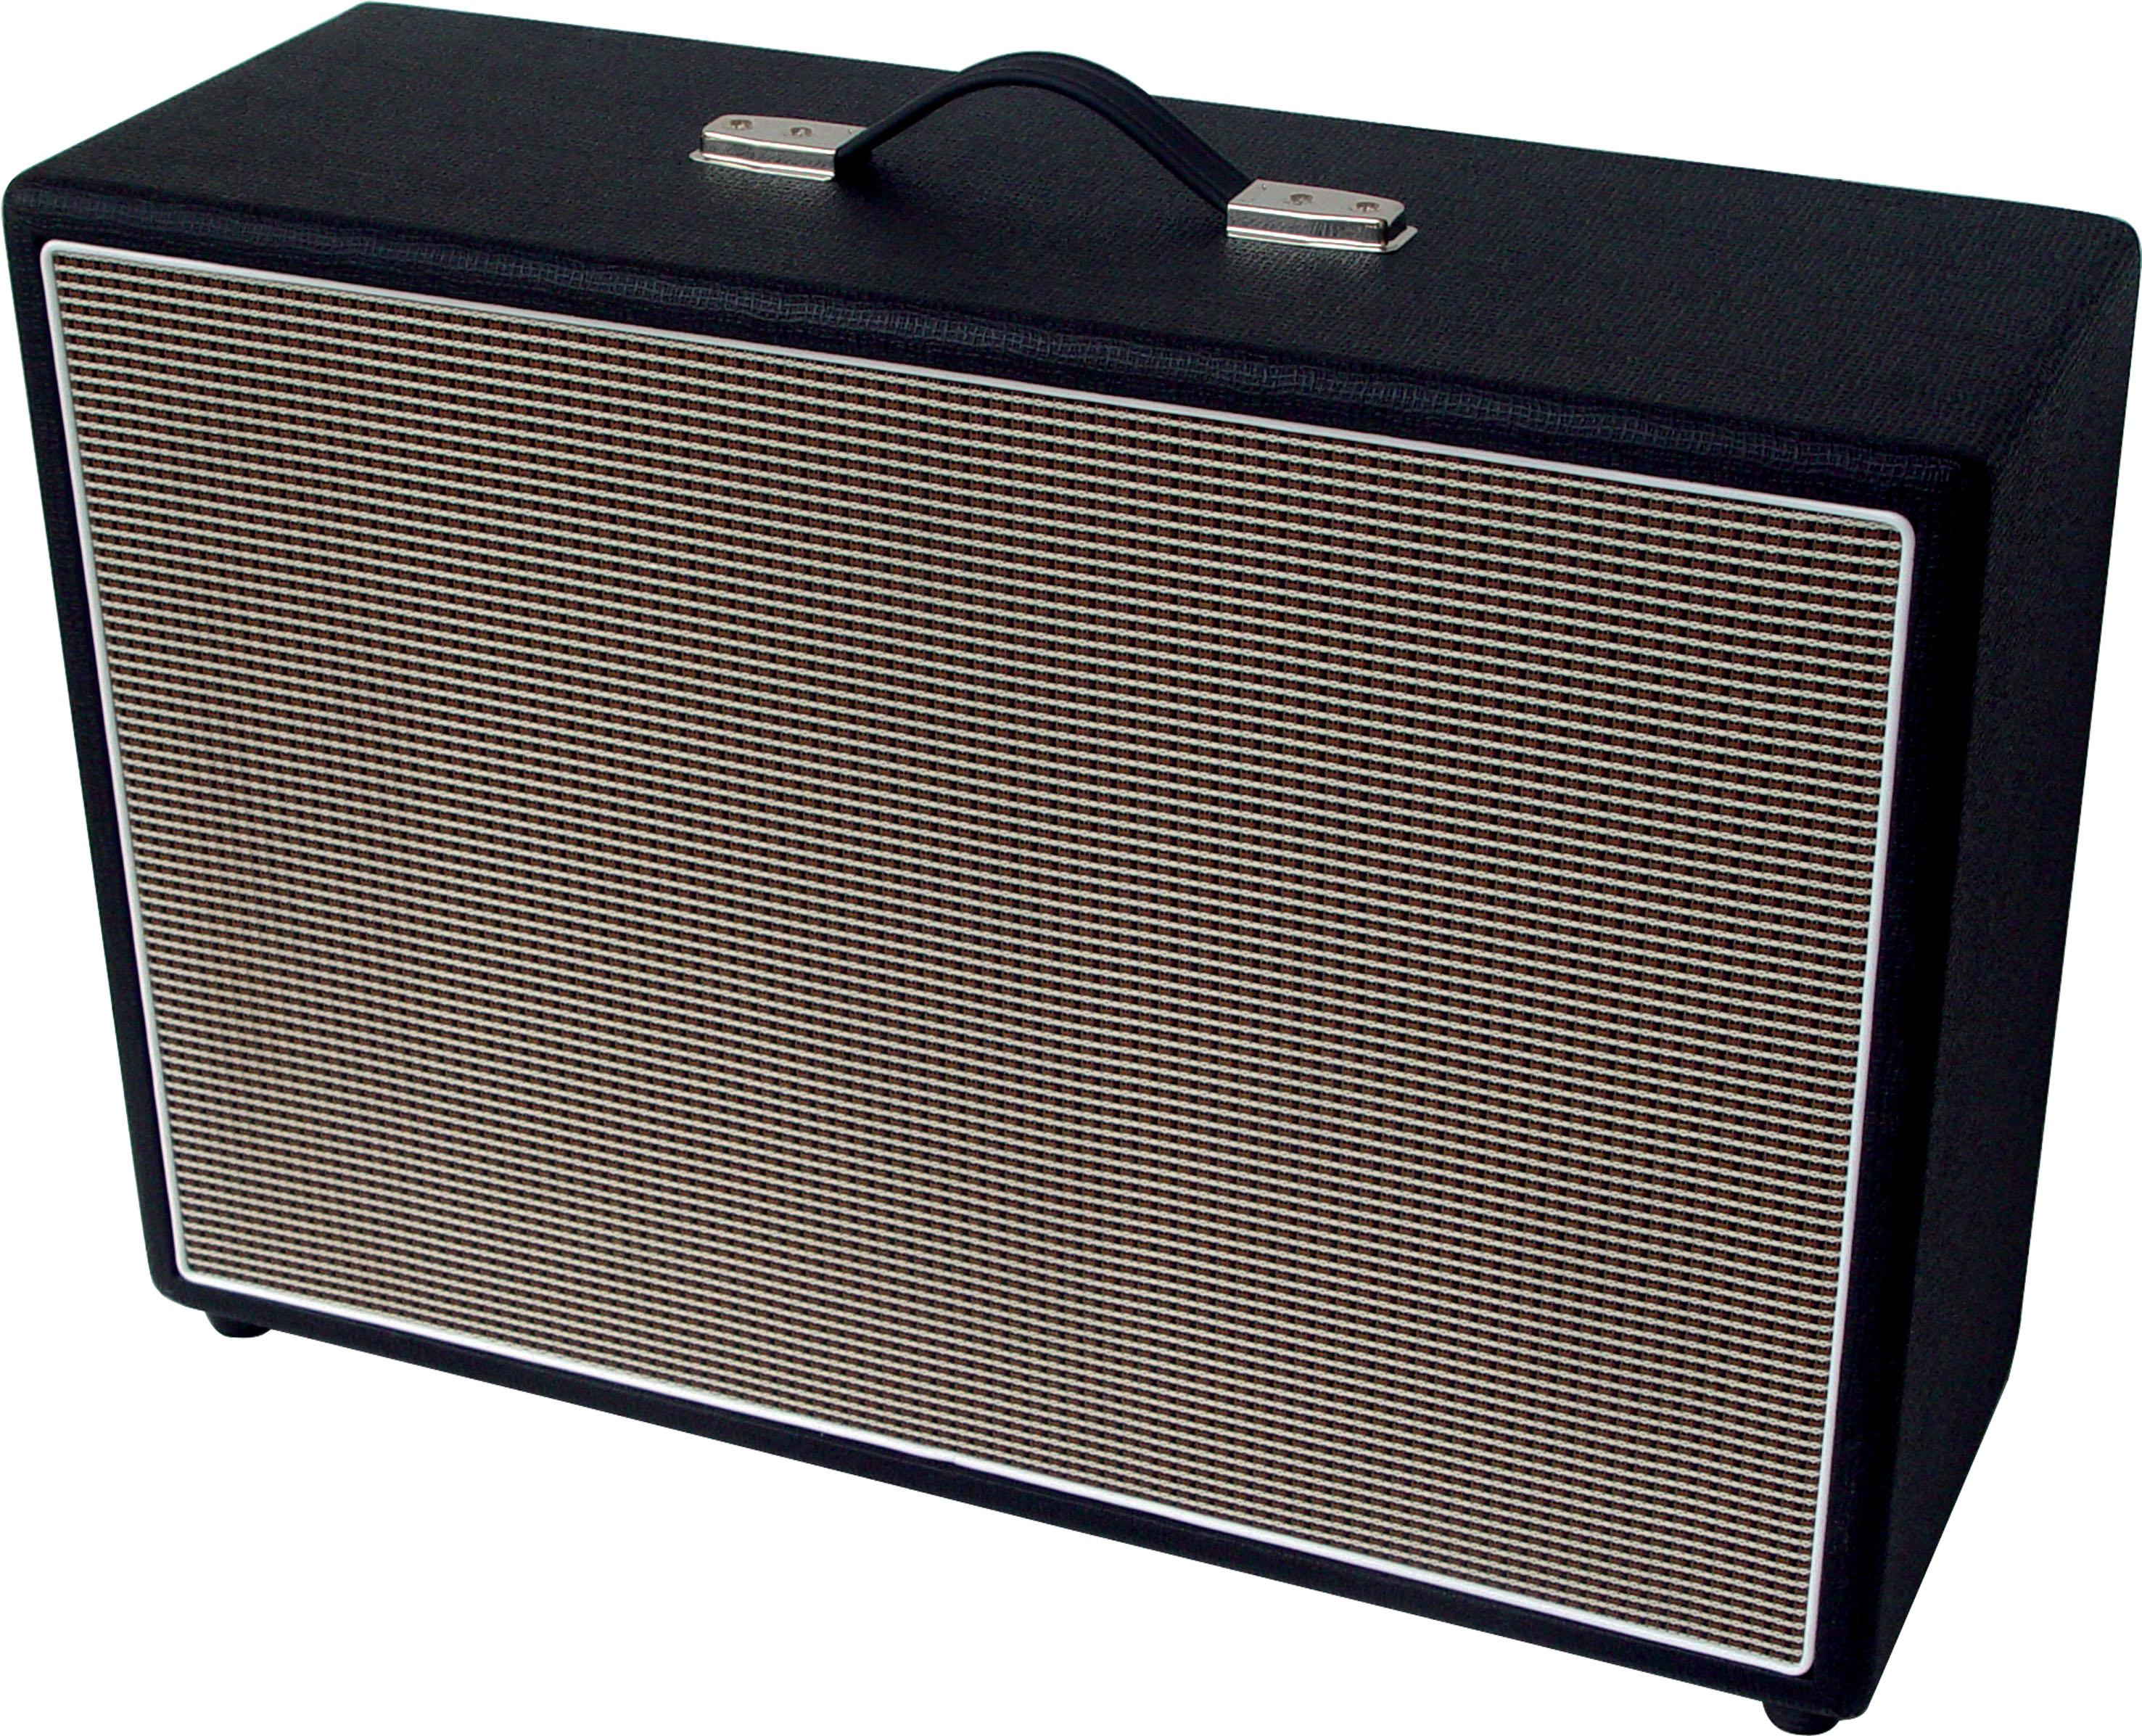 Kustom 1x12 Cabinet Amps